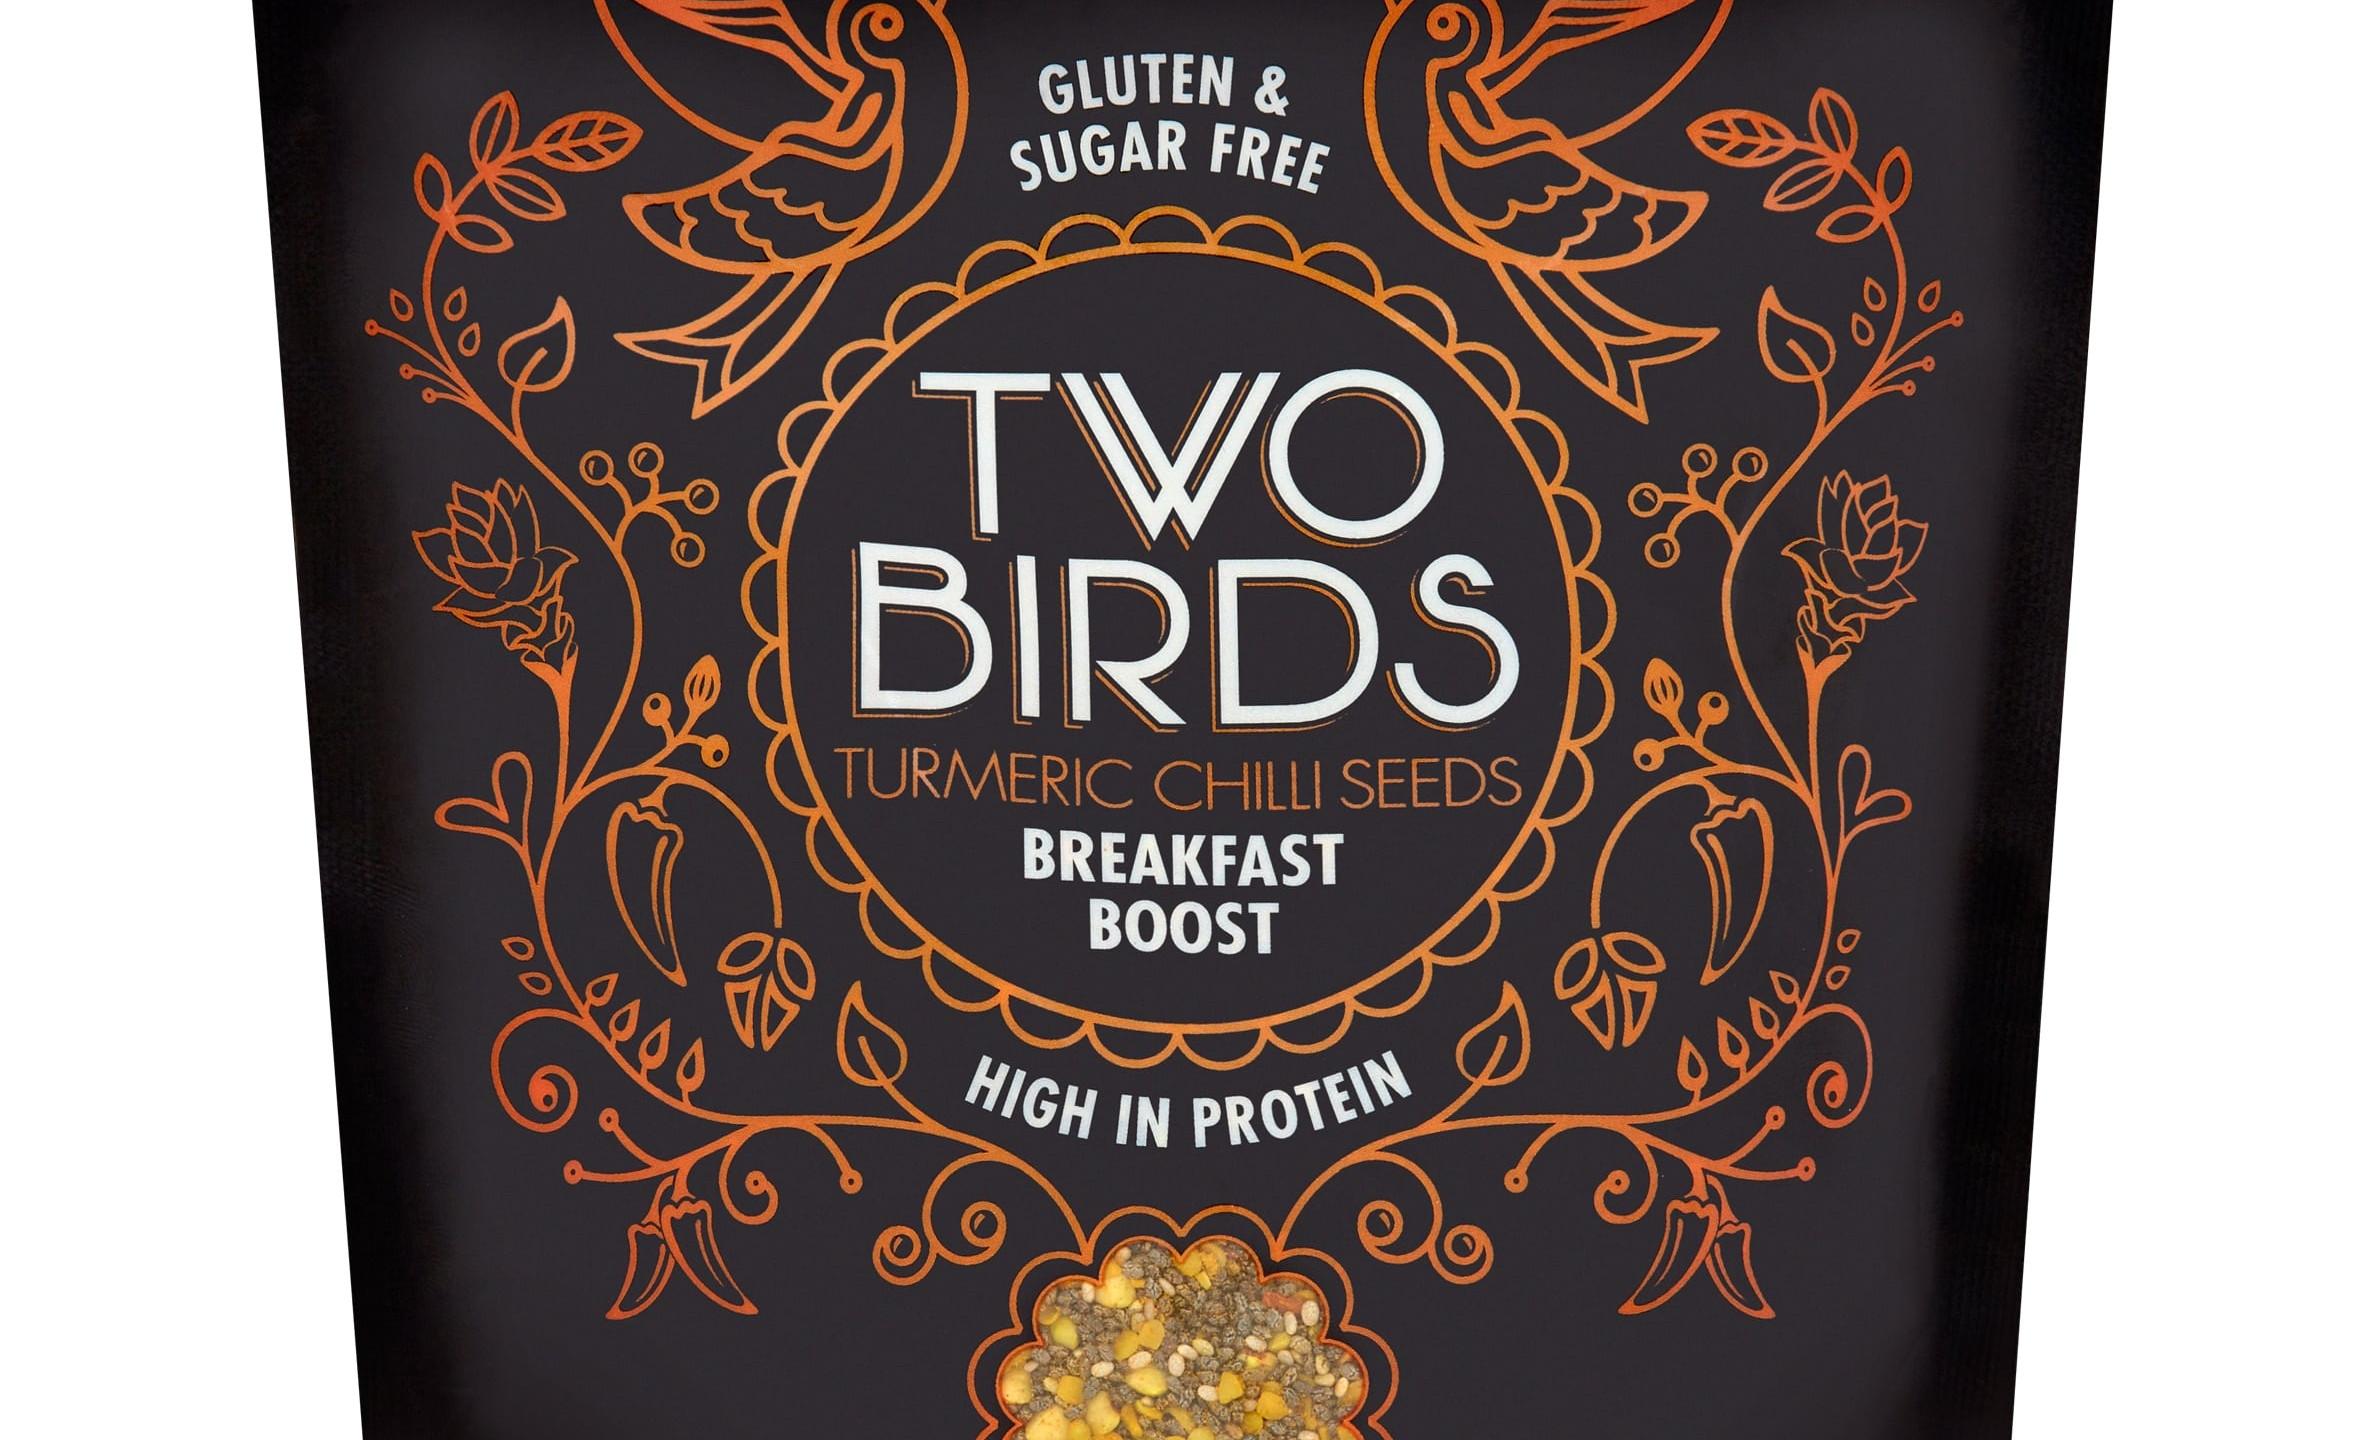 Turmeric Chilli Seeds Breakfast Boos